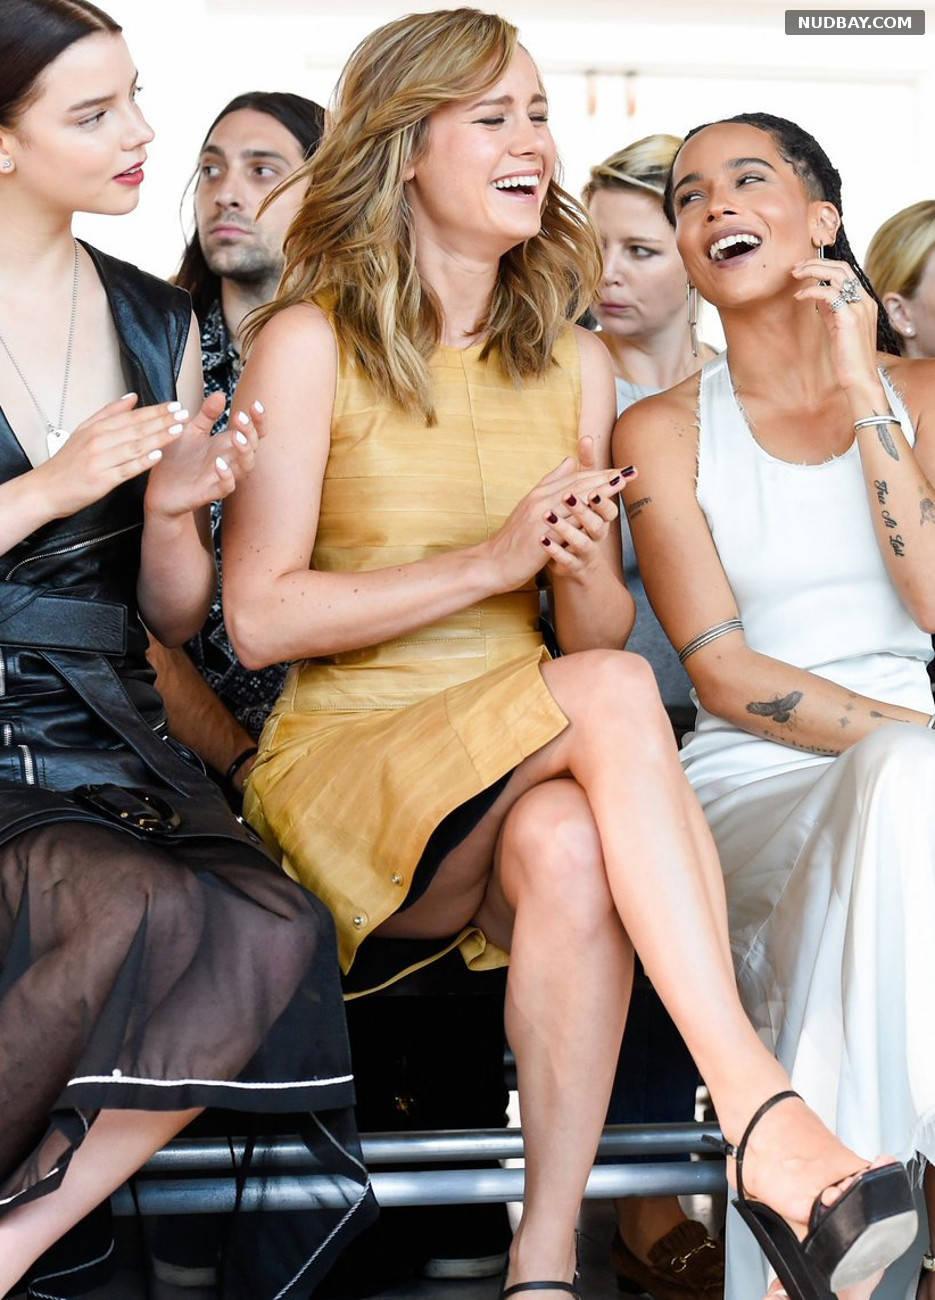 Brie Larson upskirt